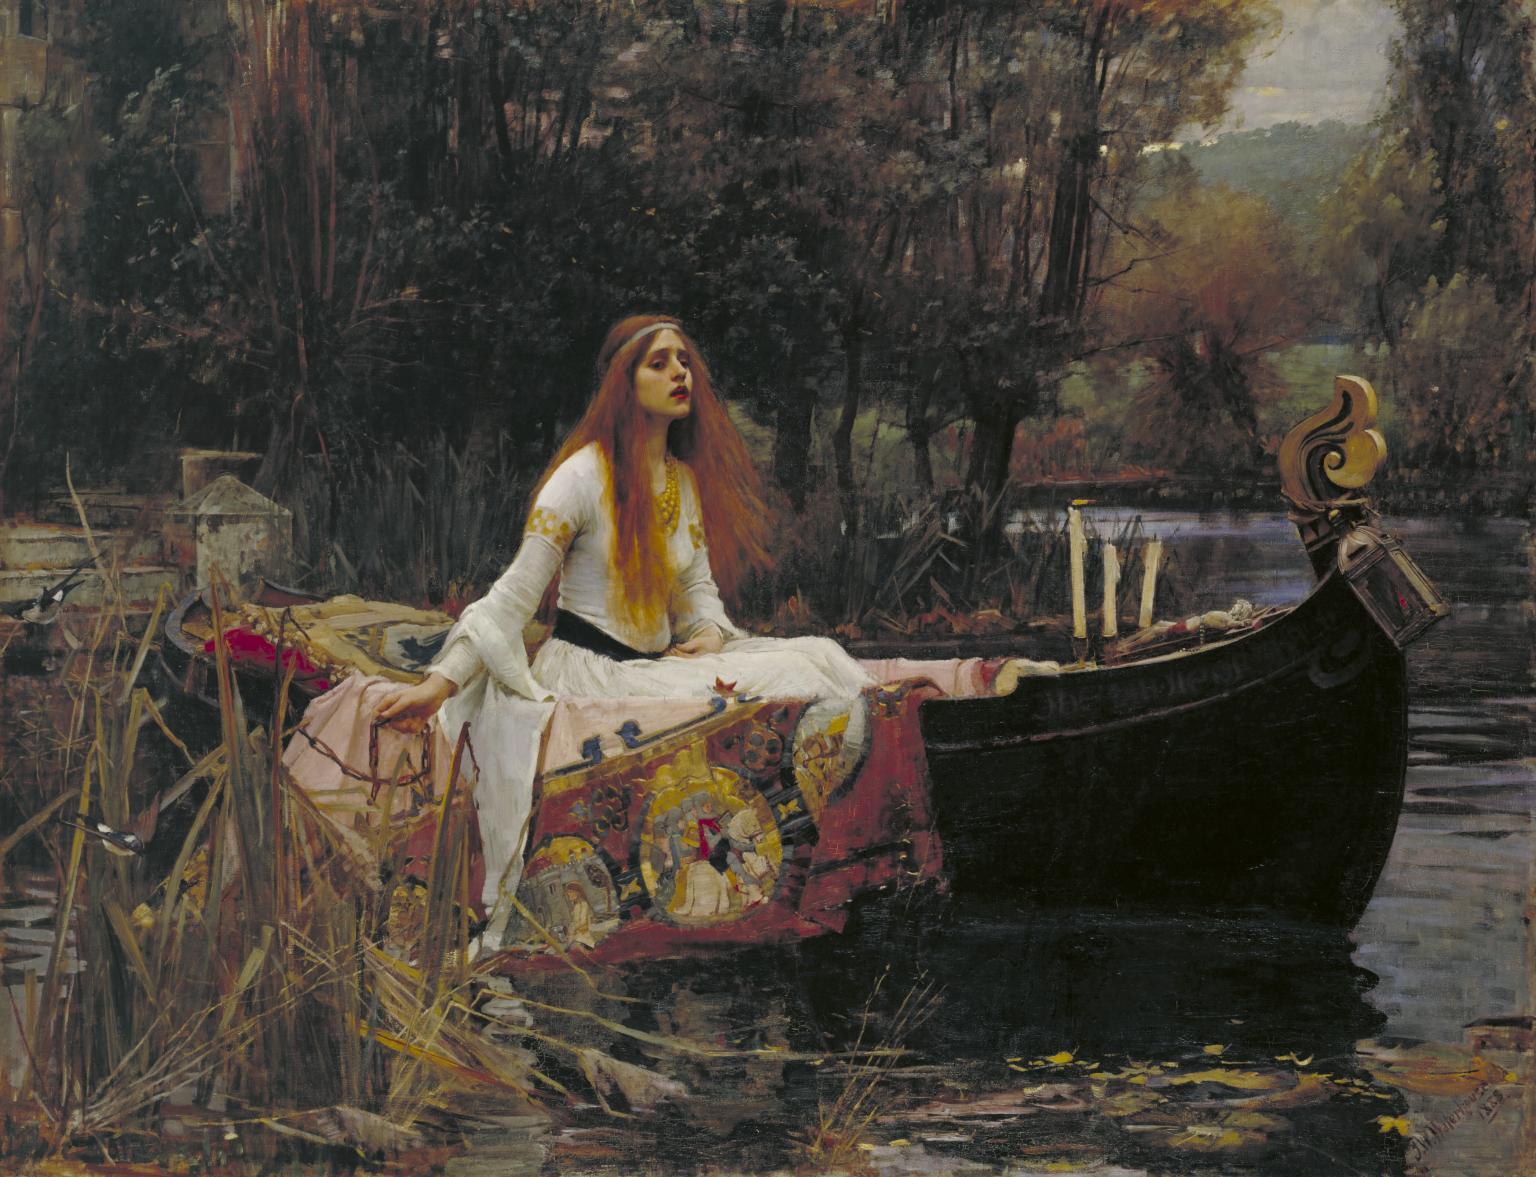 John William Waterhouse, The Lady of Shallot, 1888